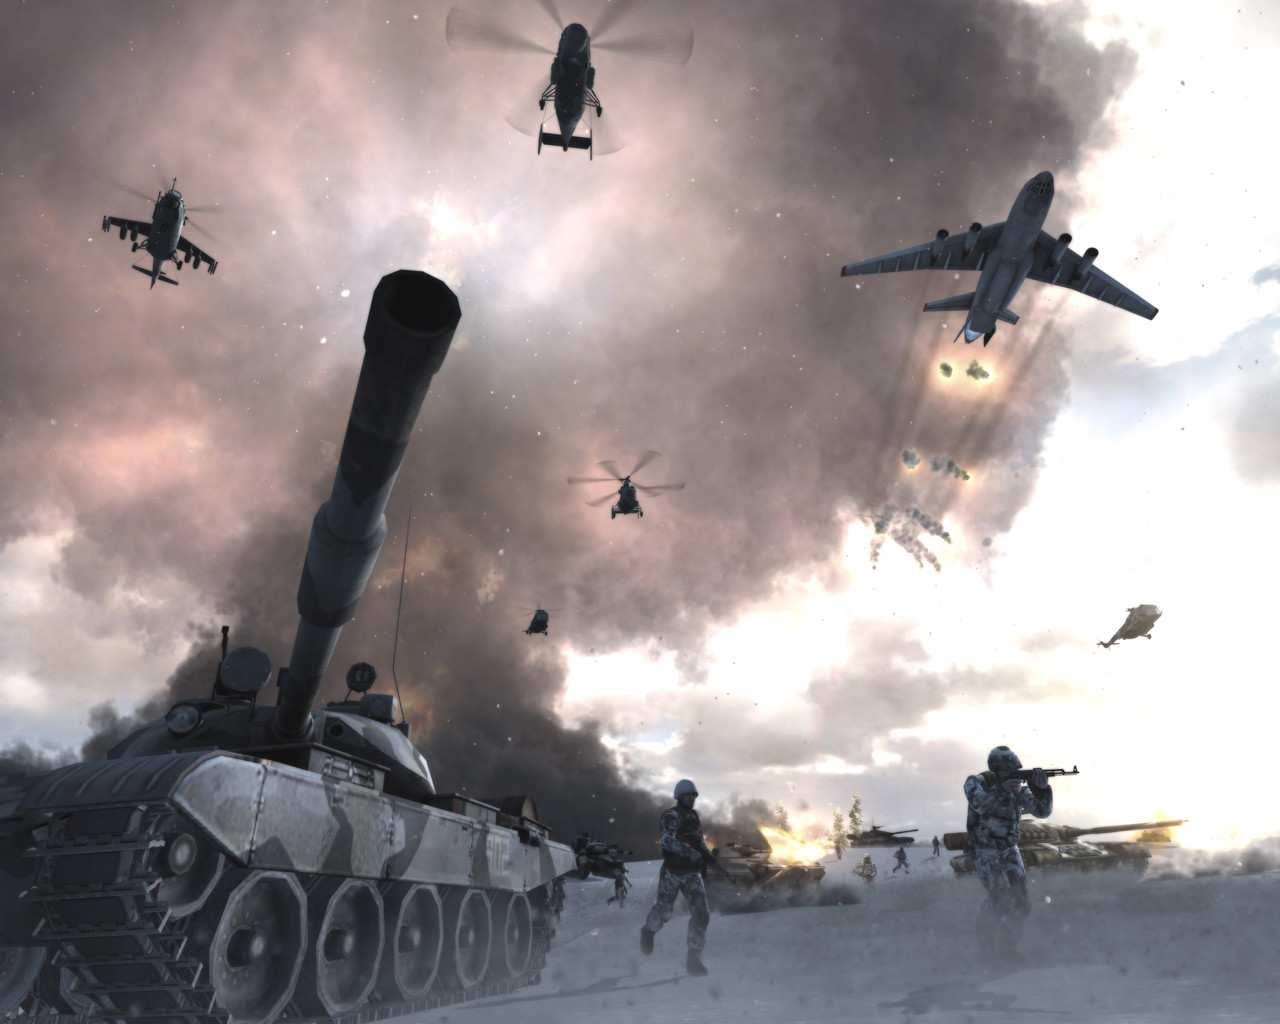 На пороге III Мировой: битва за Алеппо и Конец Света — пророчества и оперативная обстановка на севере Сирии (КАРТА) | Русская весна